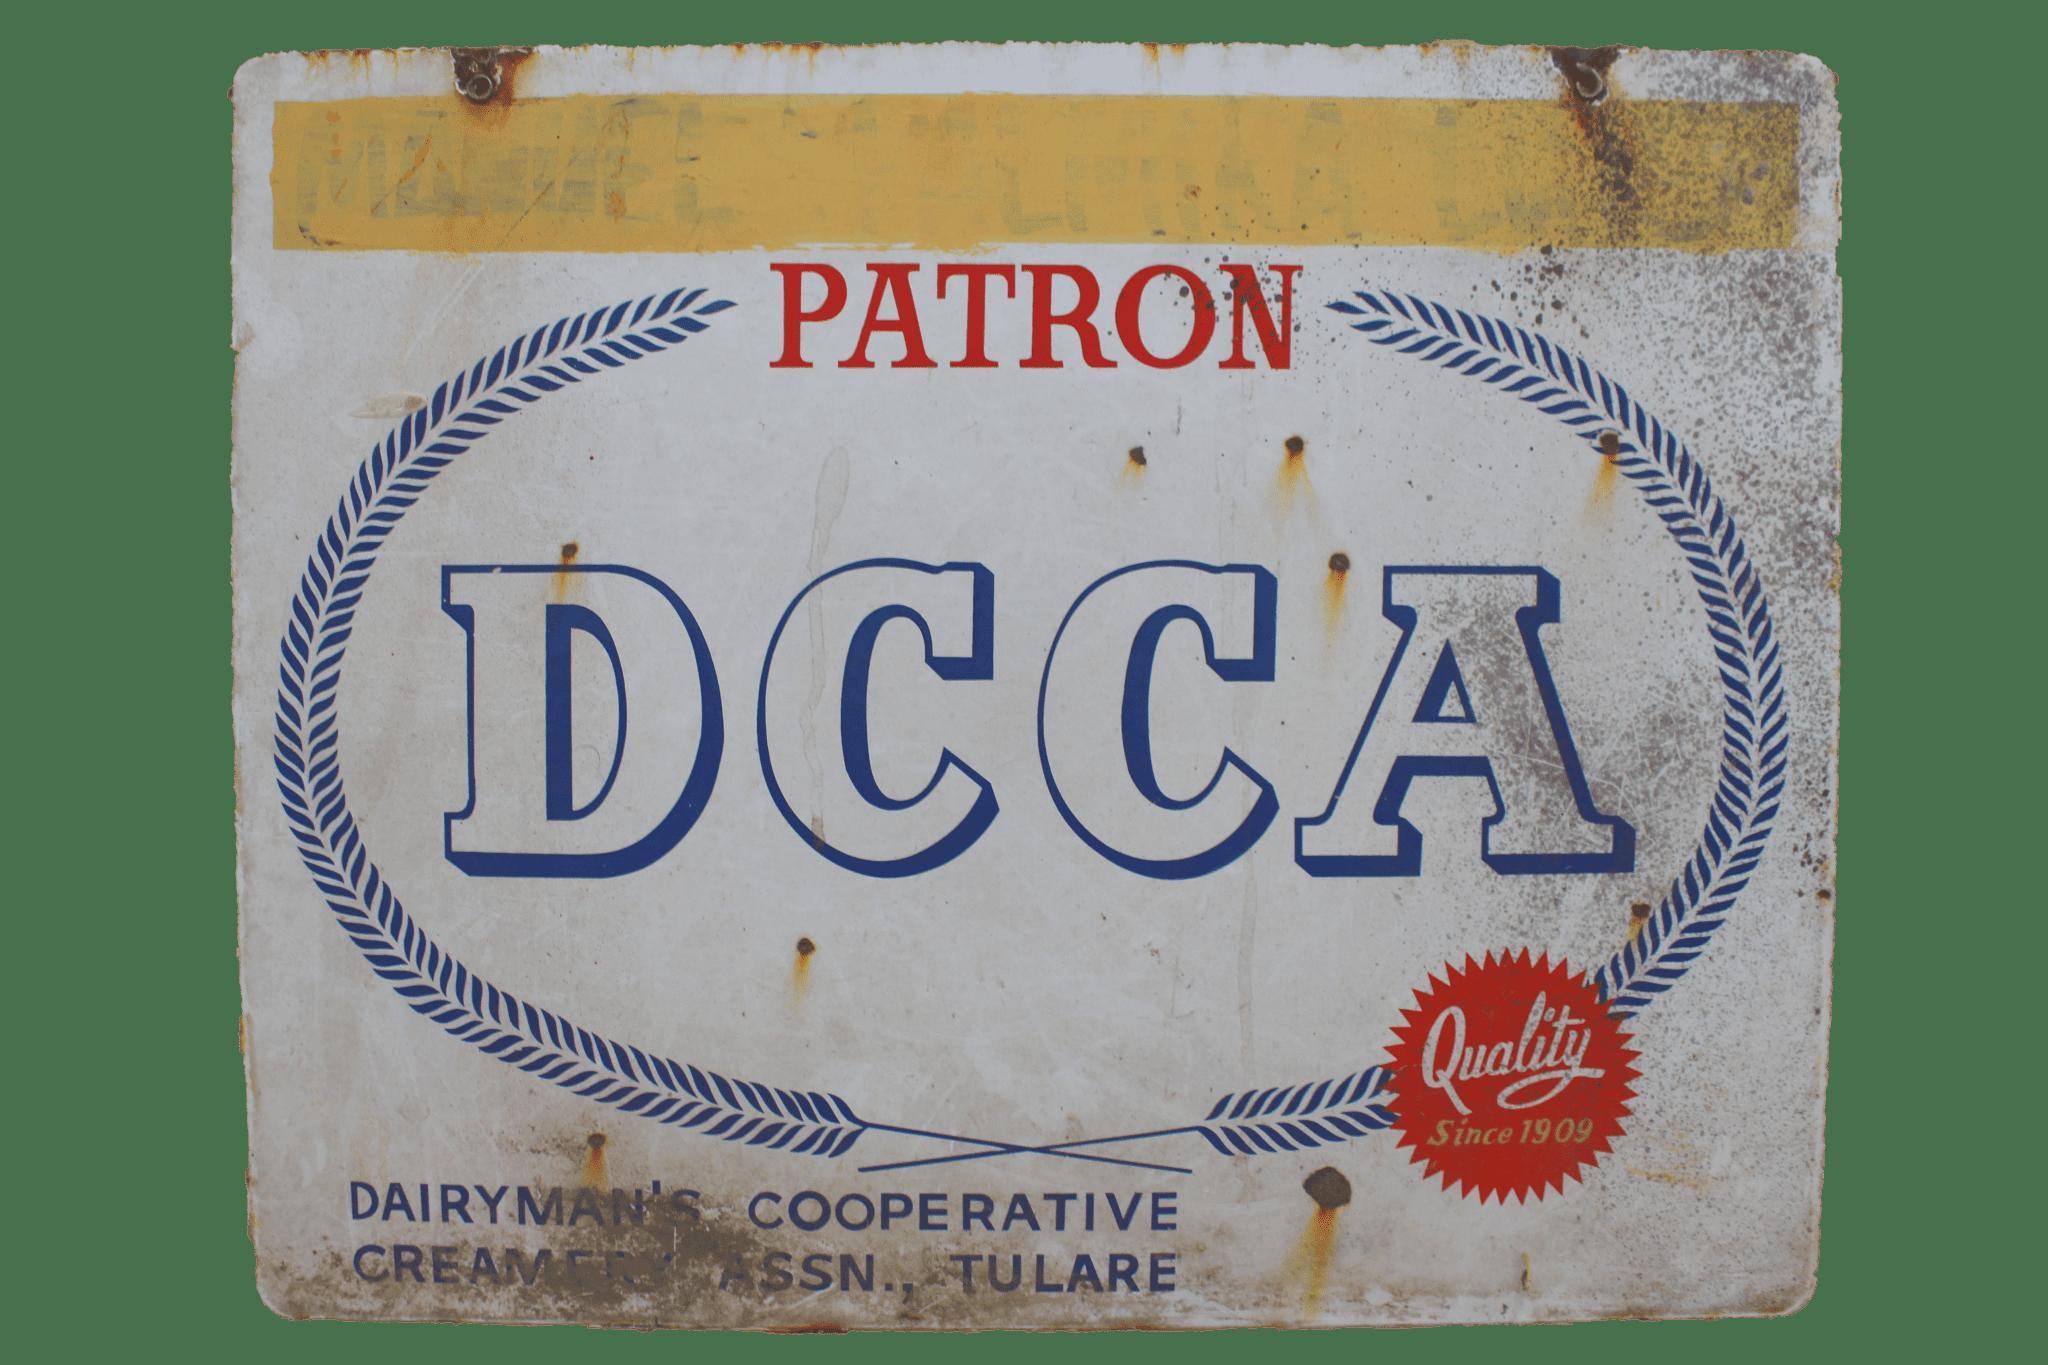 Craig Hartman's grandfather's DCCA Patron recognition